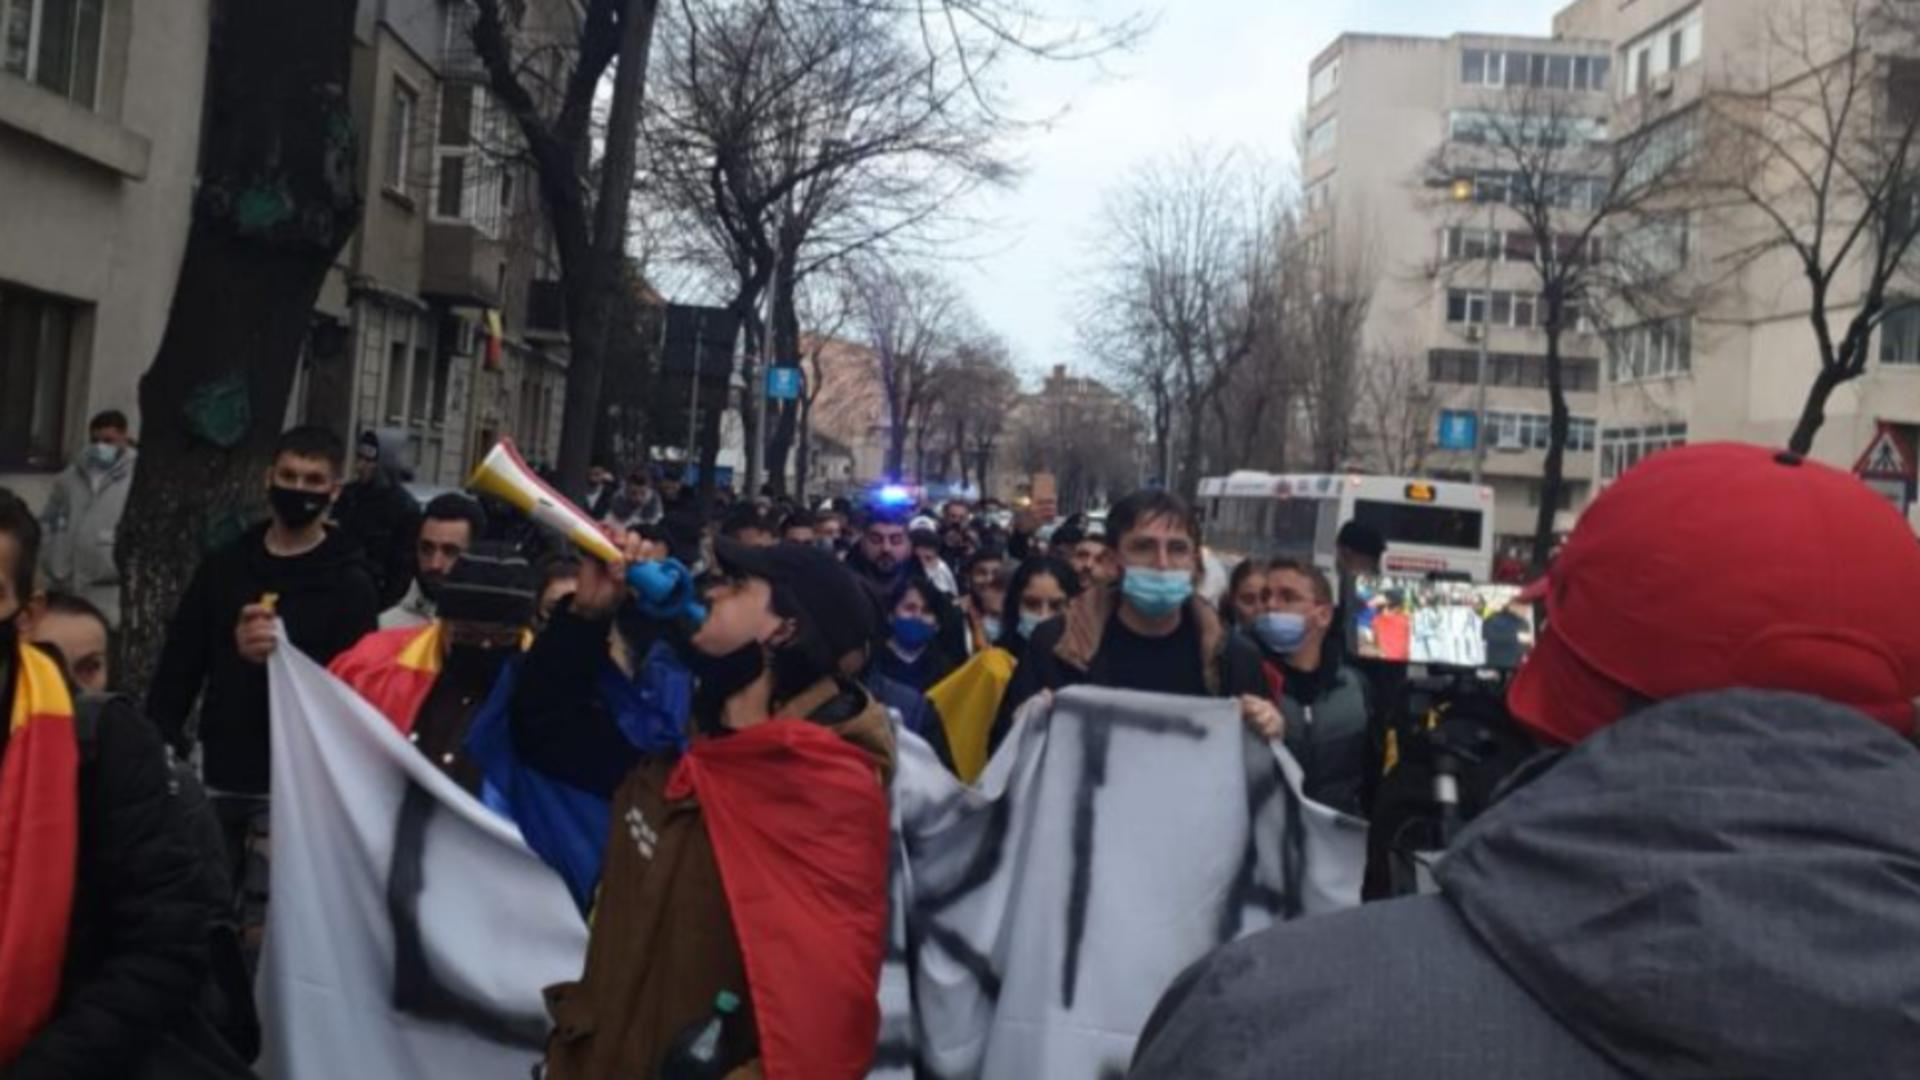 Proteste anti-restricții în Arad, Constanța/Incident violent la Prefectura Constanța Foto: TomisNews.ro